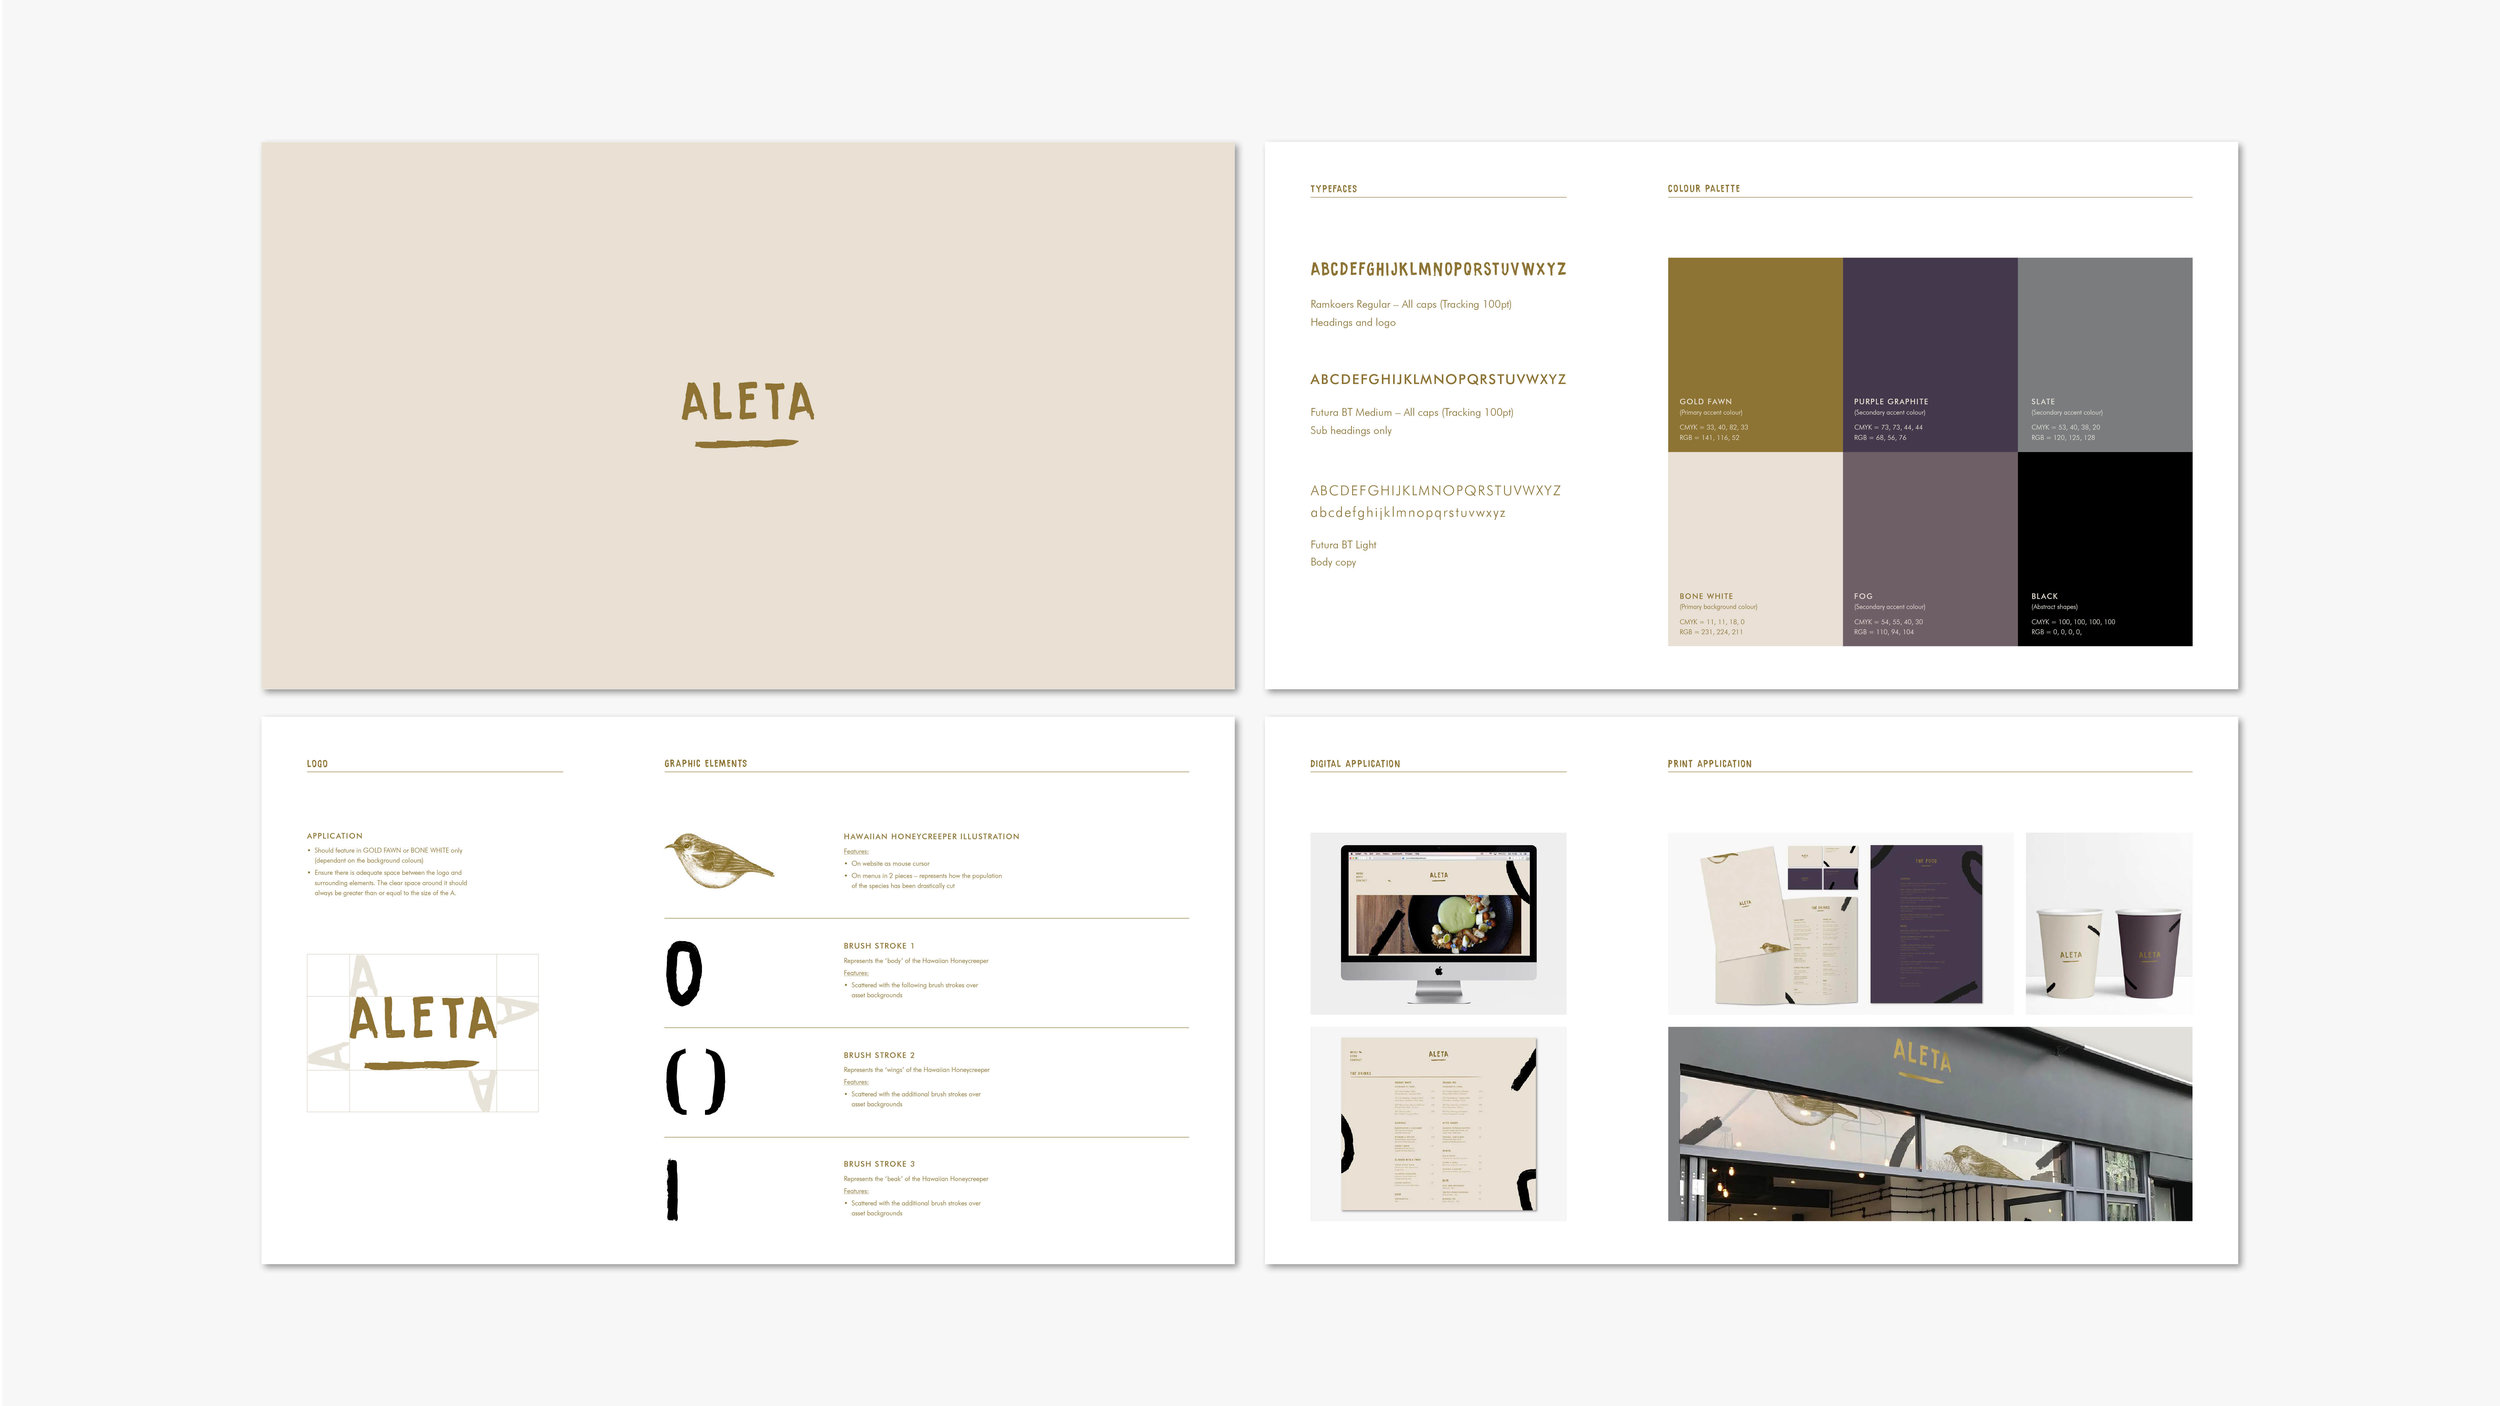 Aleta_Restaurant Brand Guidelines_Mockup5.jpg